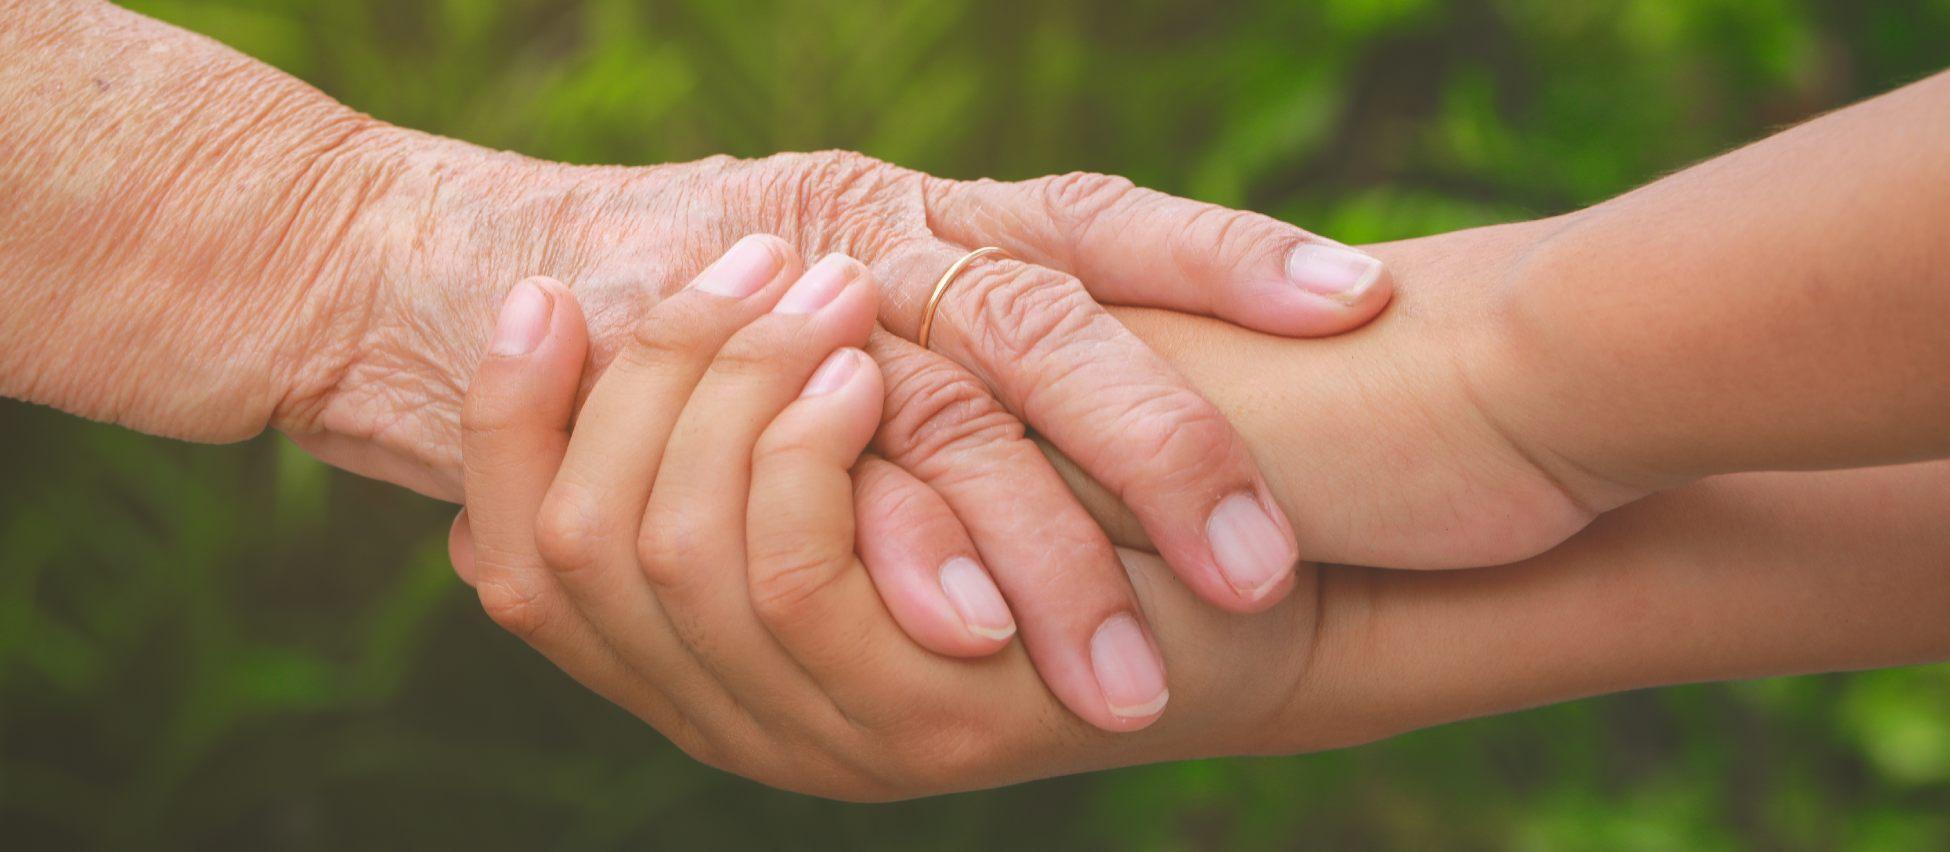 Elder care law firm-Sean Cox Law